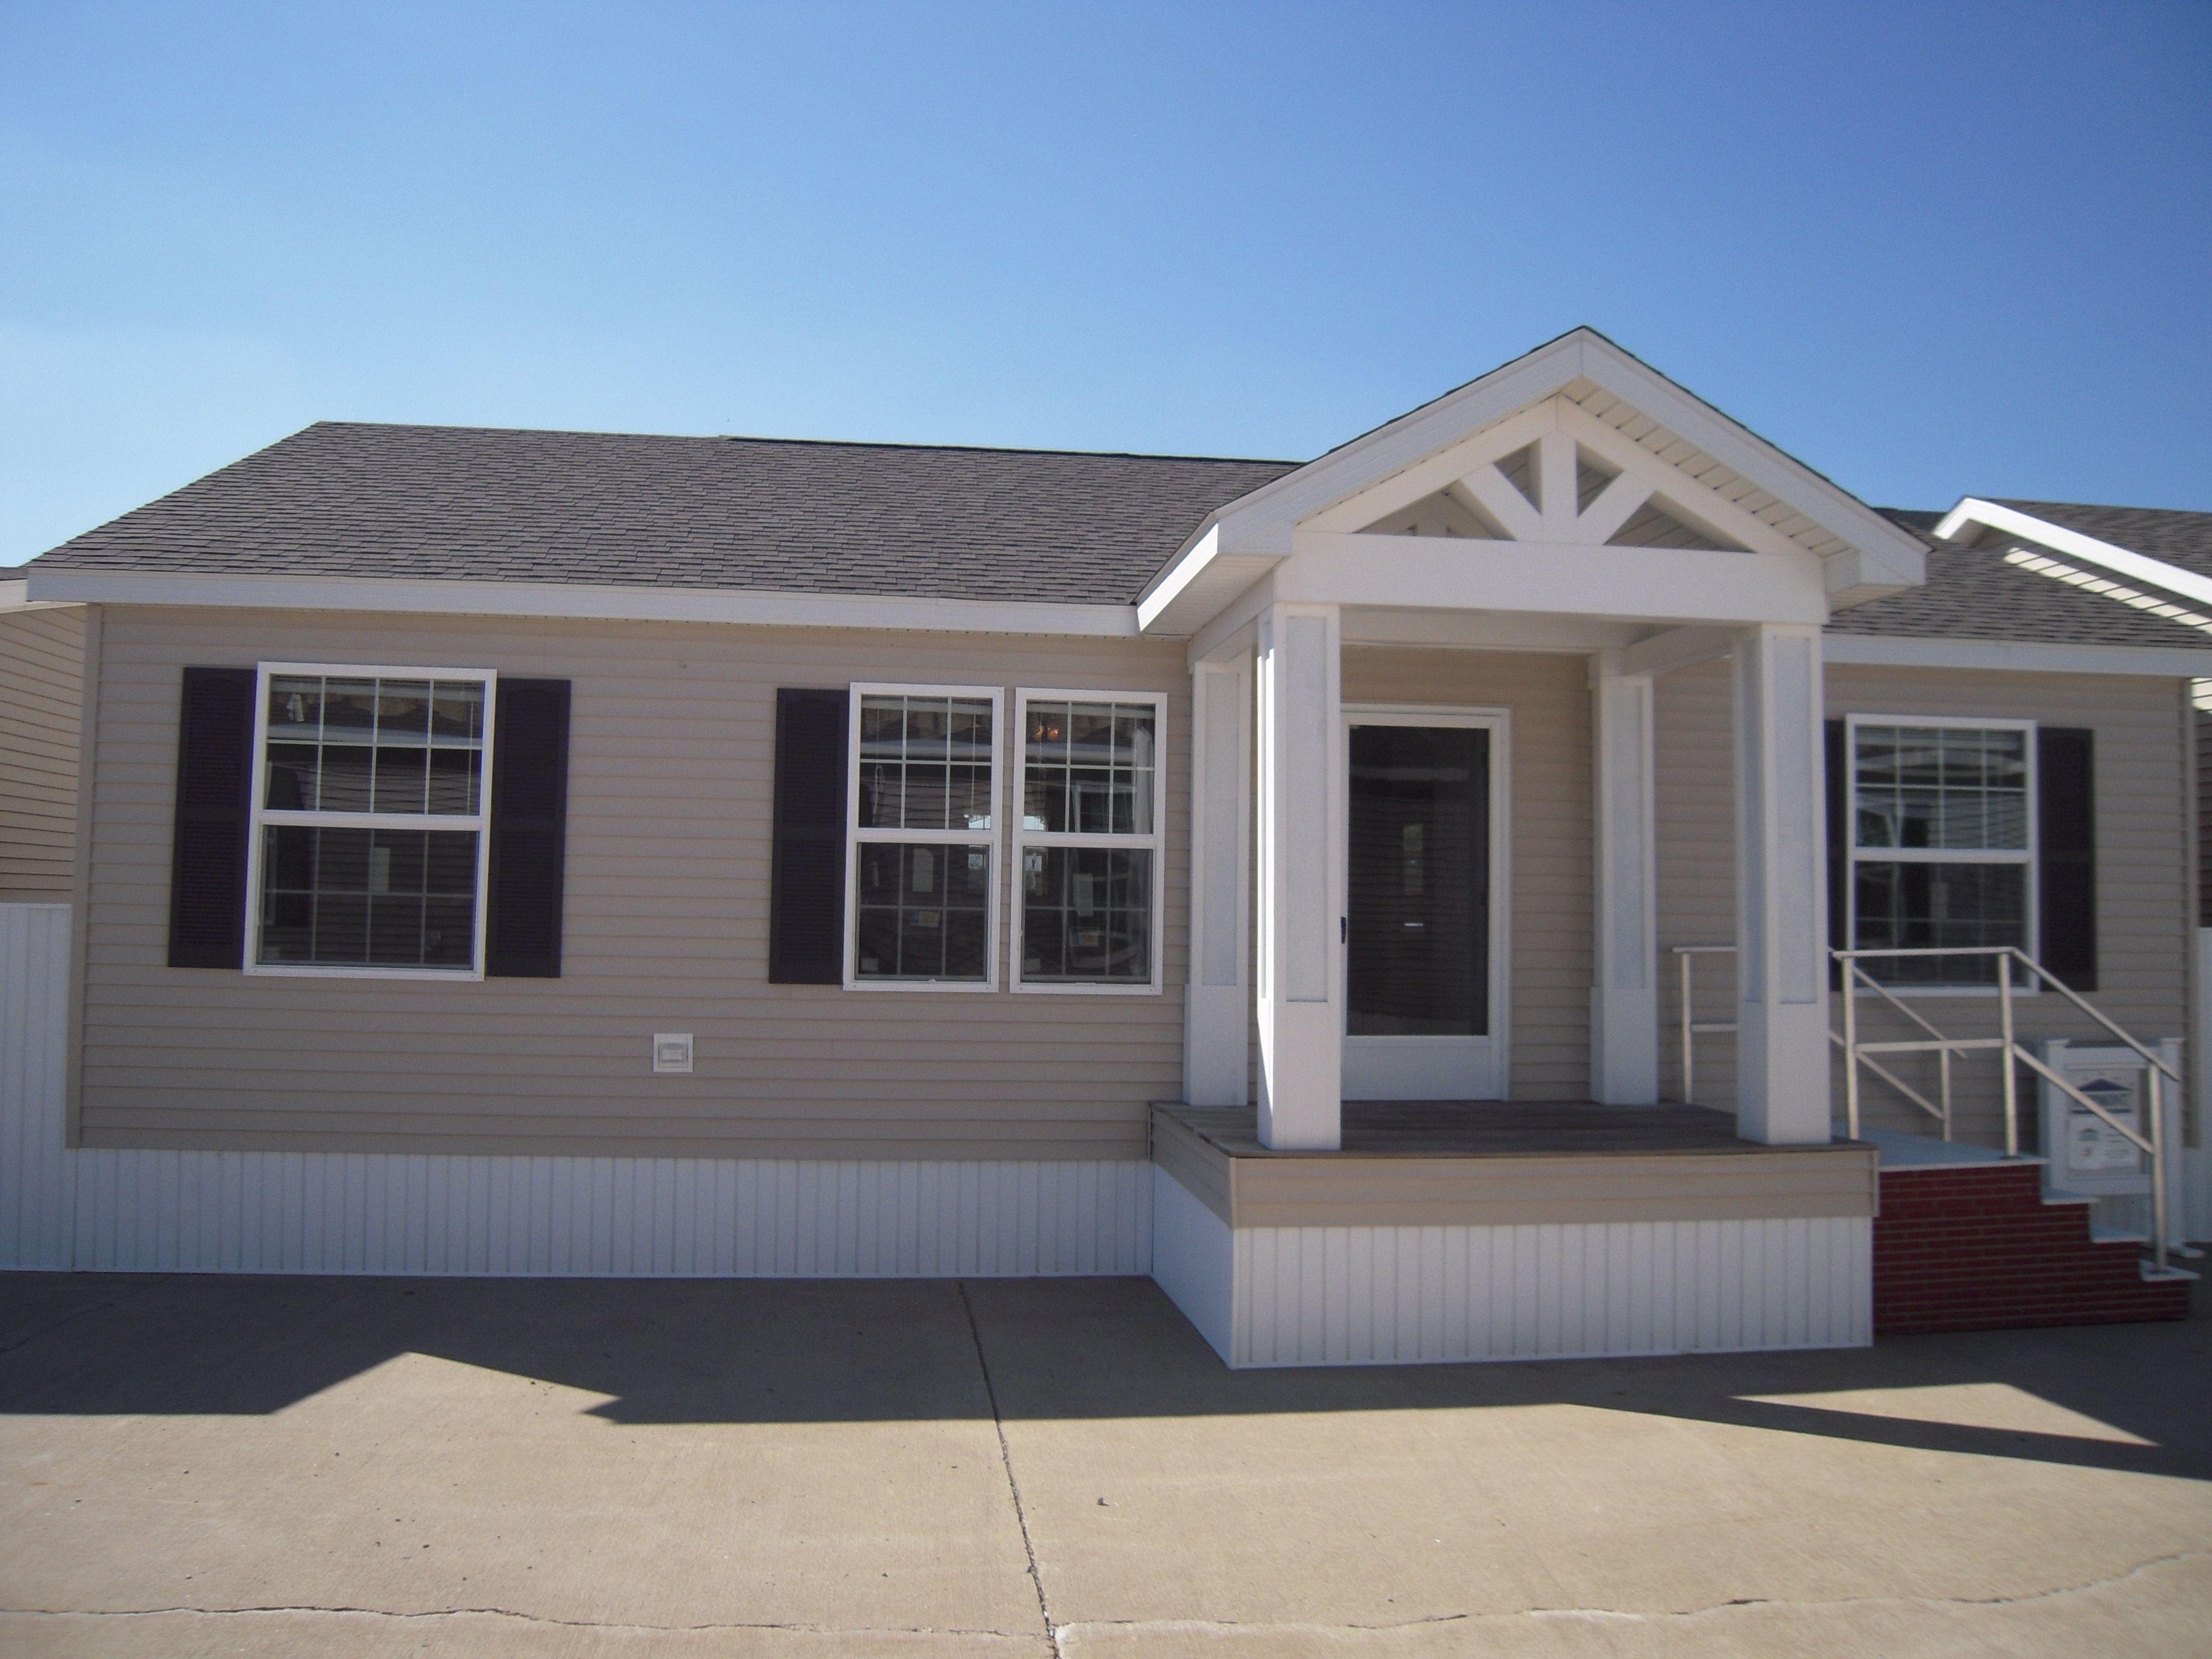 Modular Home Porch On A Fairmont Triumph Mobile Home Exteriors